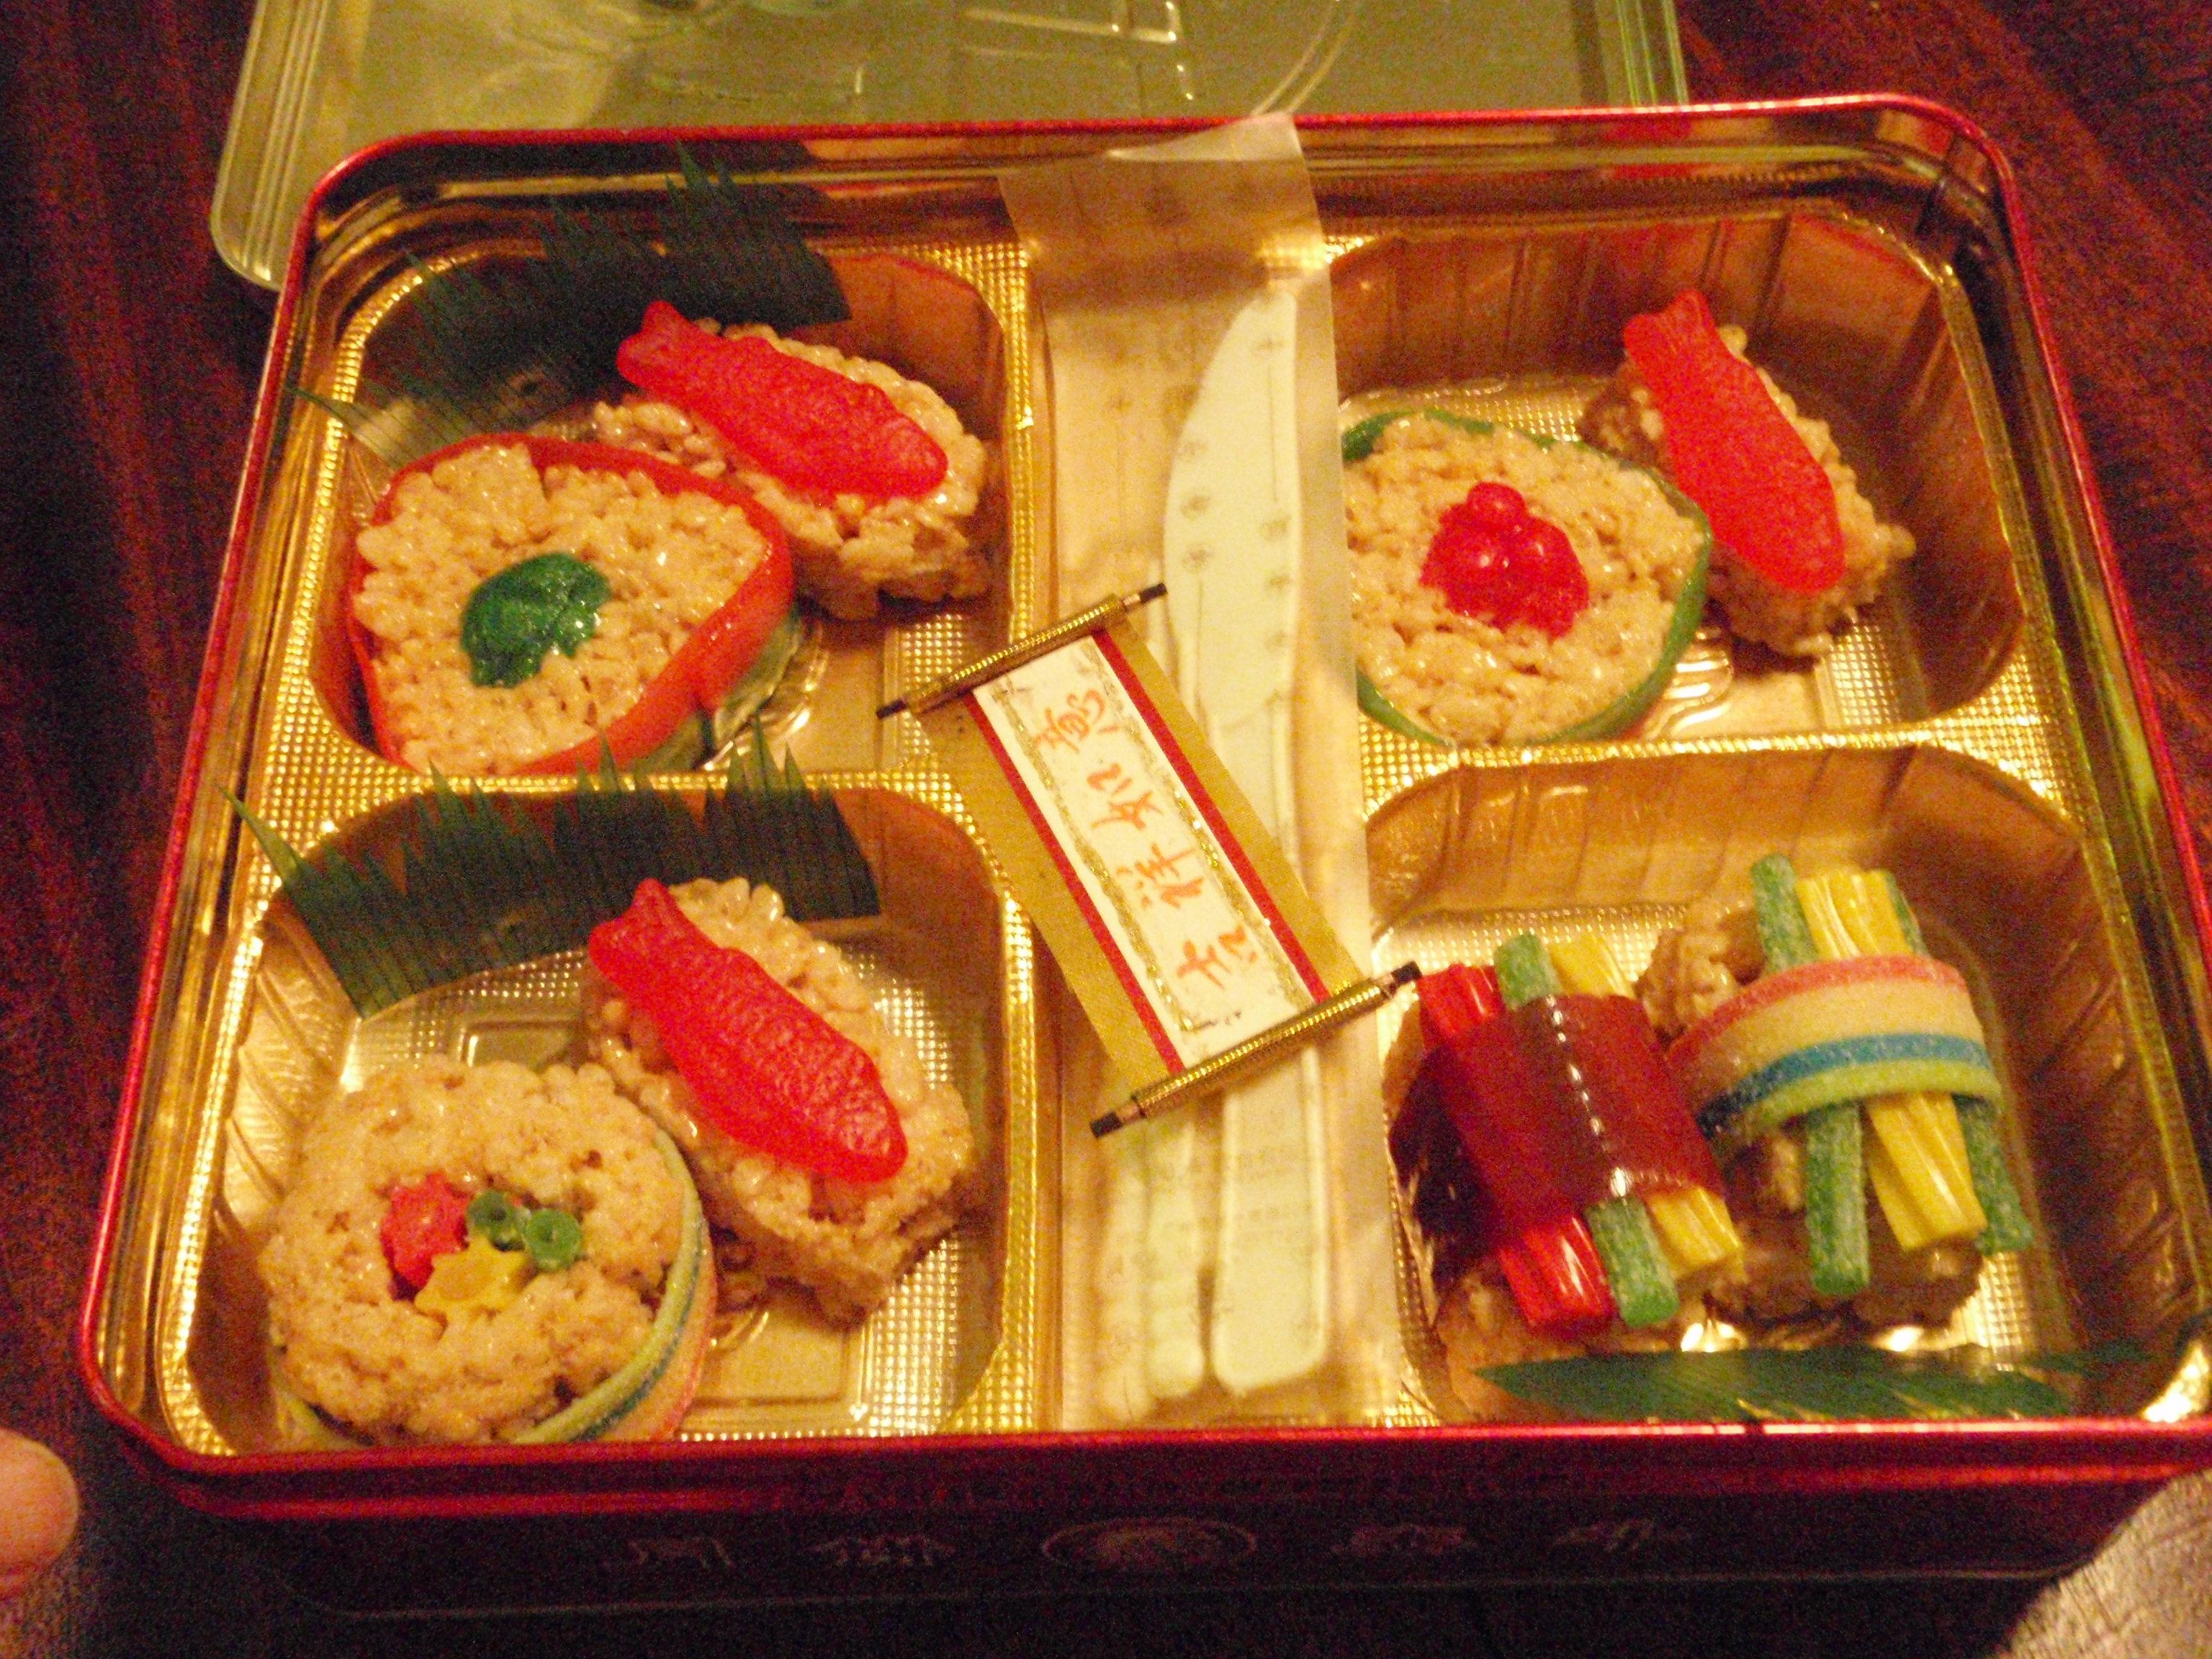 Asian Edible Gifts